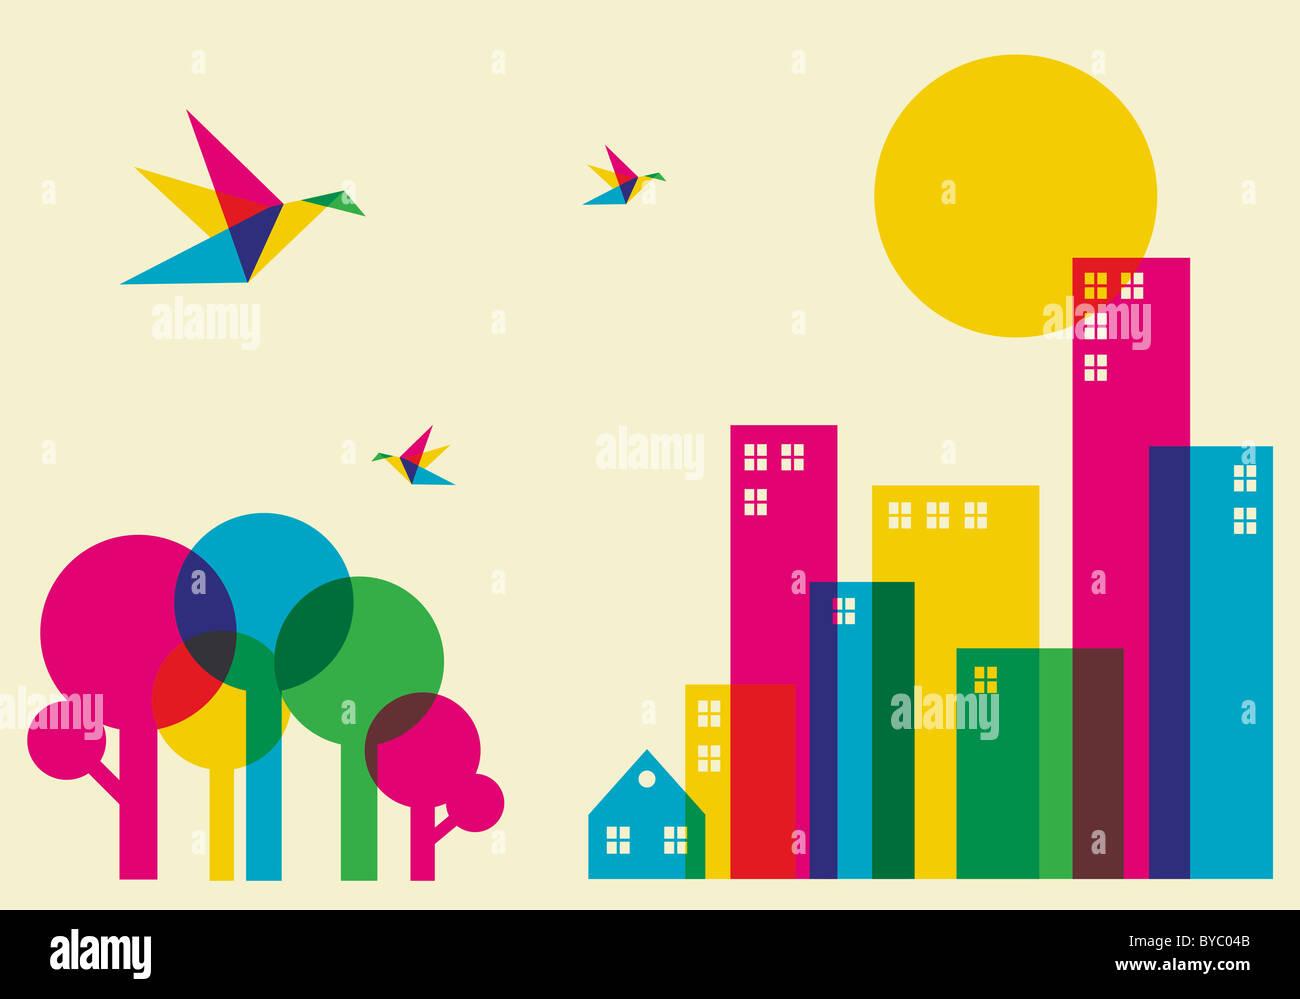 Primavera tempo na cidade. Zumbido grave de cores de pássaros voando sobre a floresta e a cidade. Arquivo de Imagens de Stock